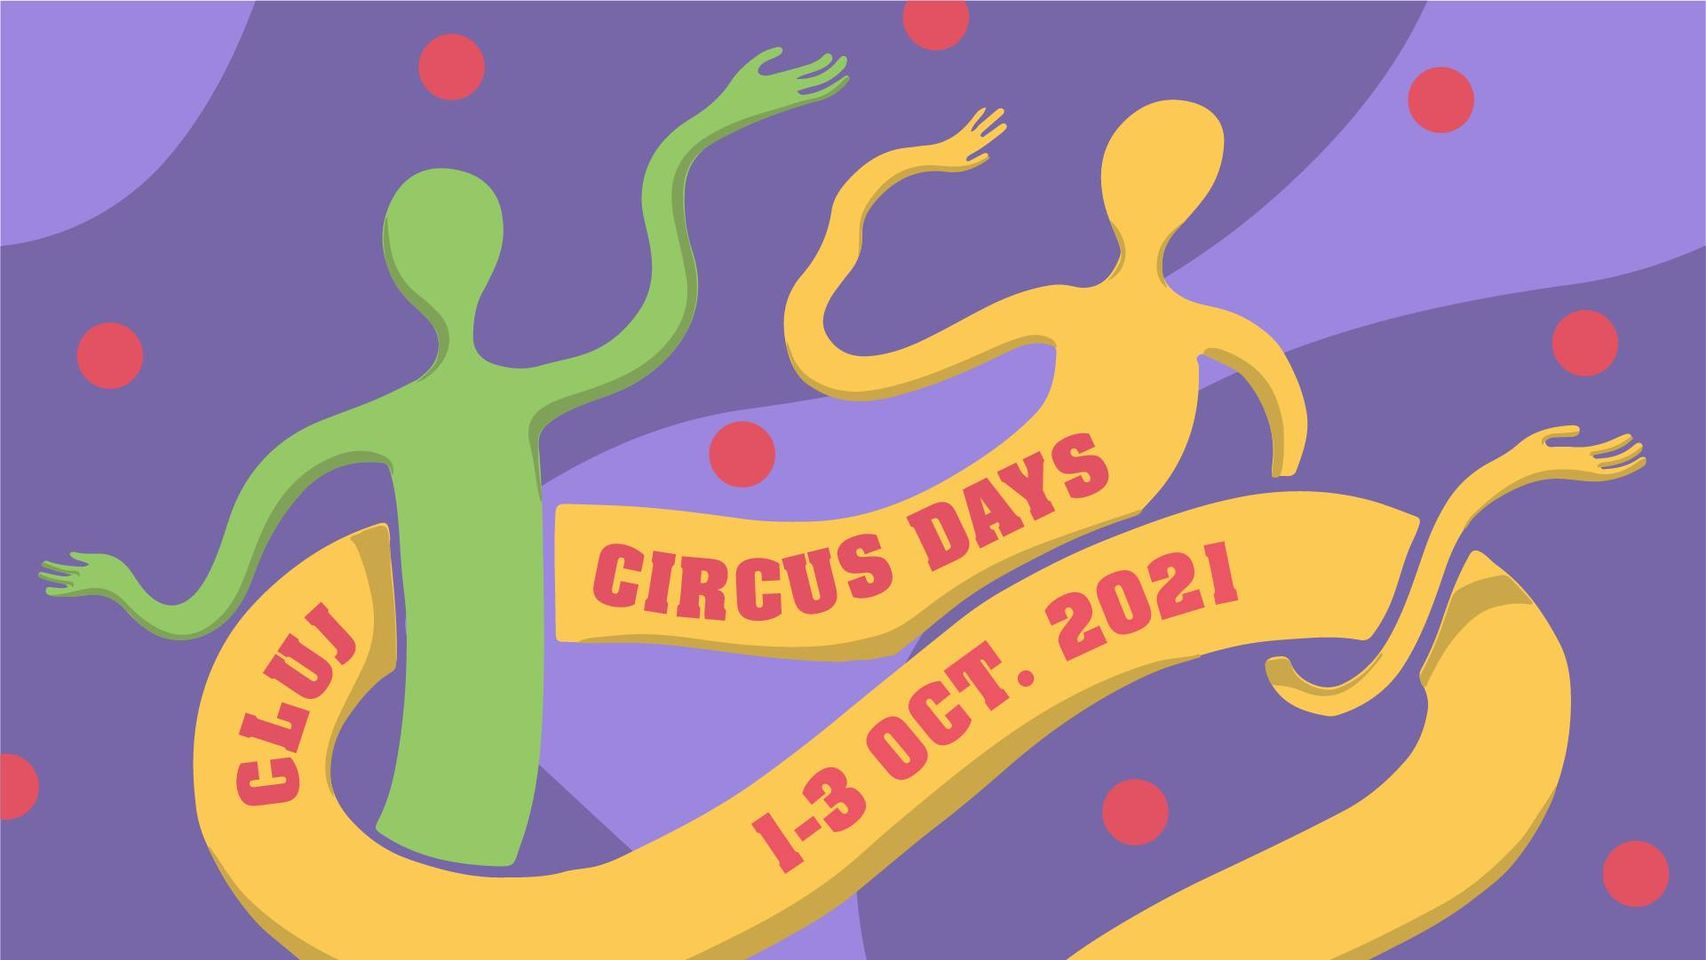 Cluj Circus Days